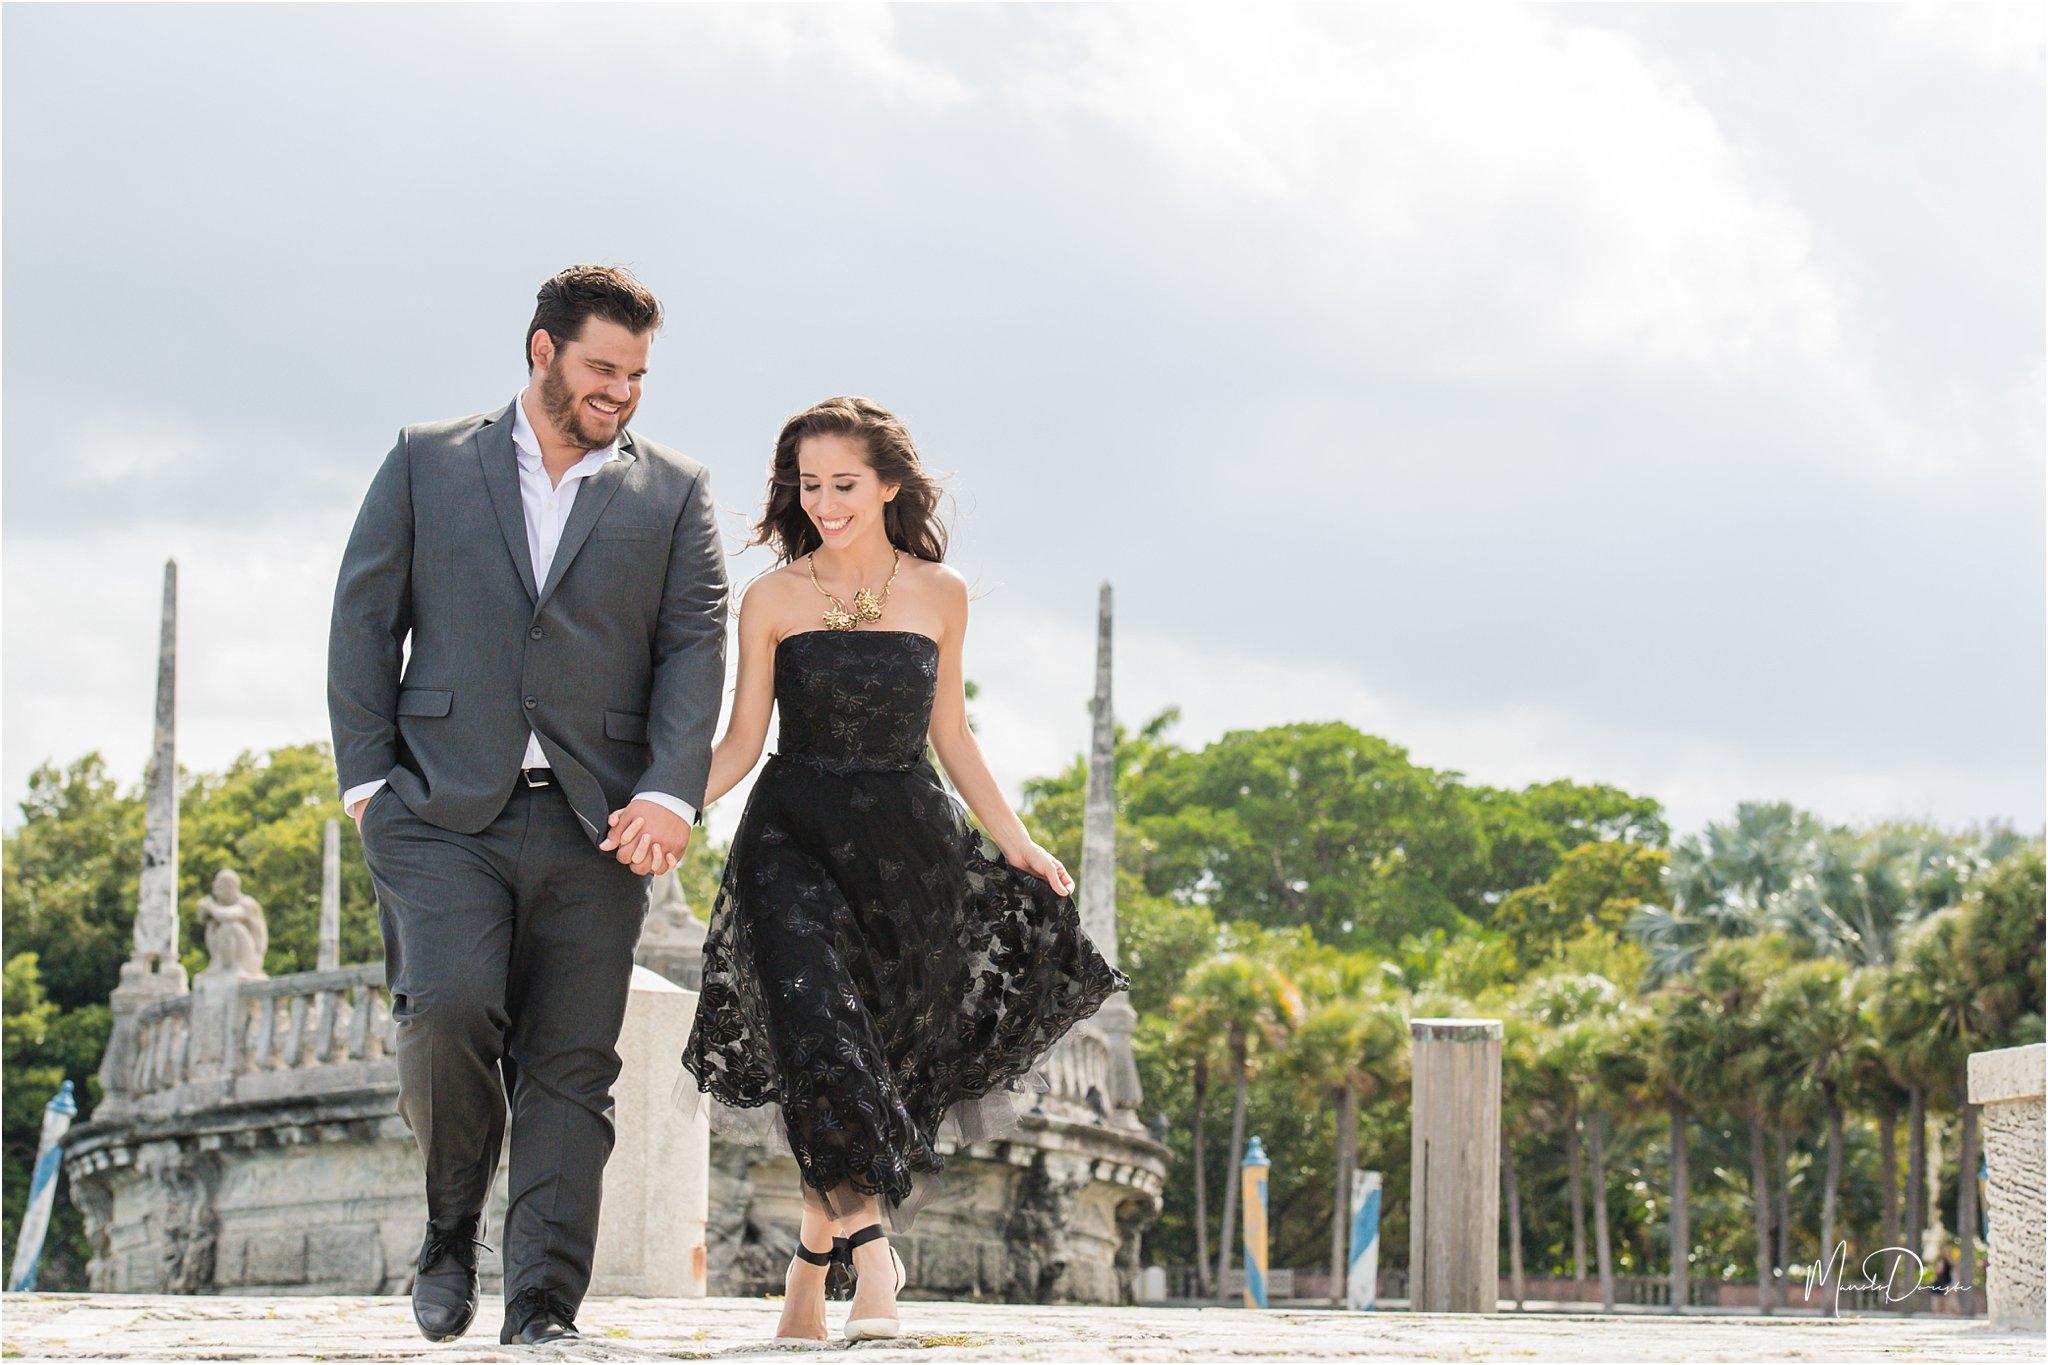 0600_ManoloDoreste_InFocusStudios_Wedding_Family_Photography_Miami_MiamiPhotographer.jpg